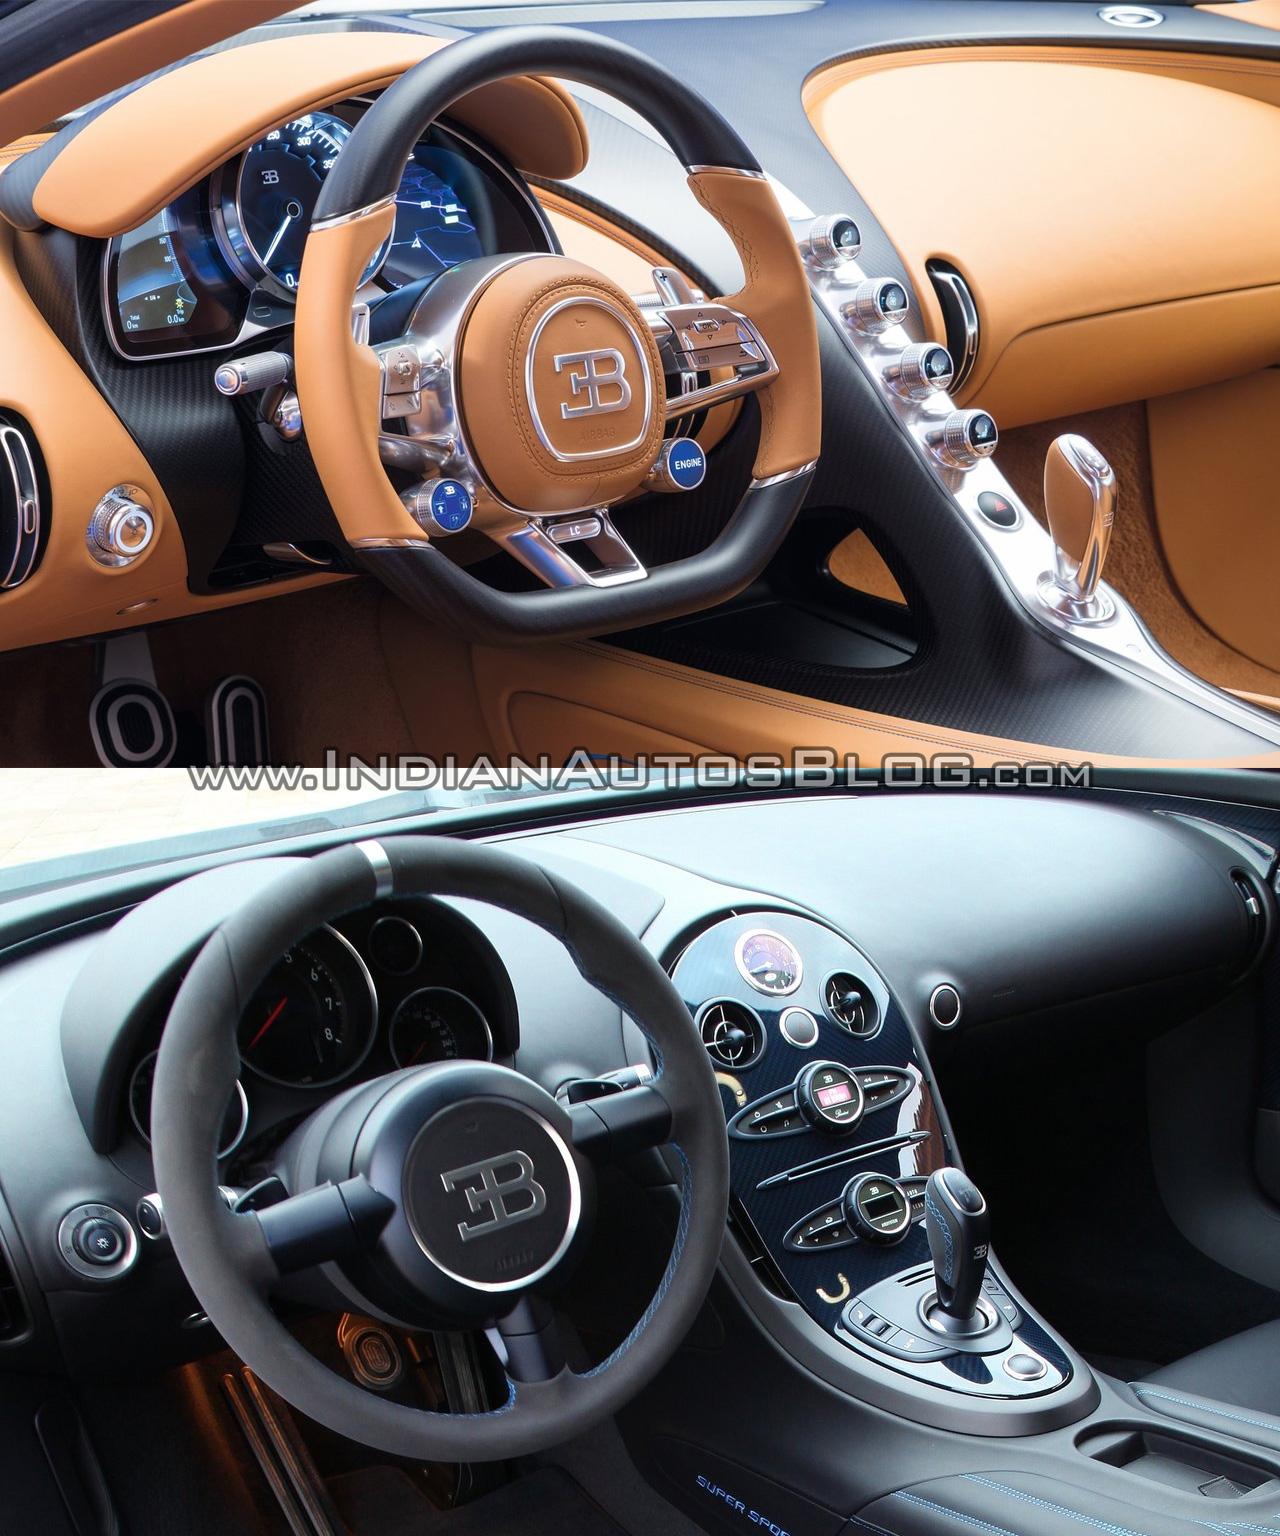 Bugatti Chiron vs. Bugatti Veyron interior dashboard - Indian Autos blog